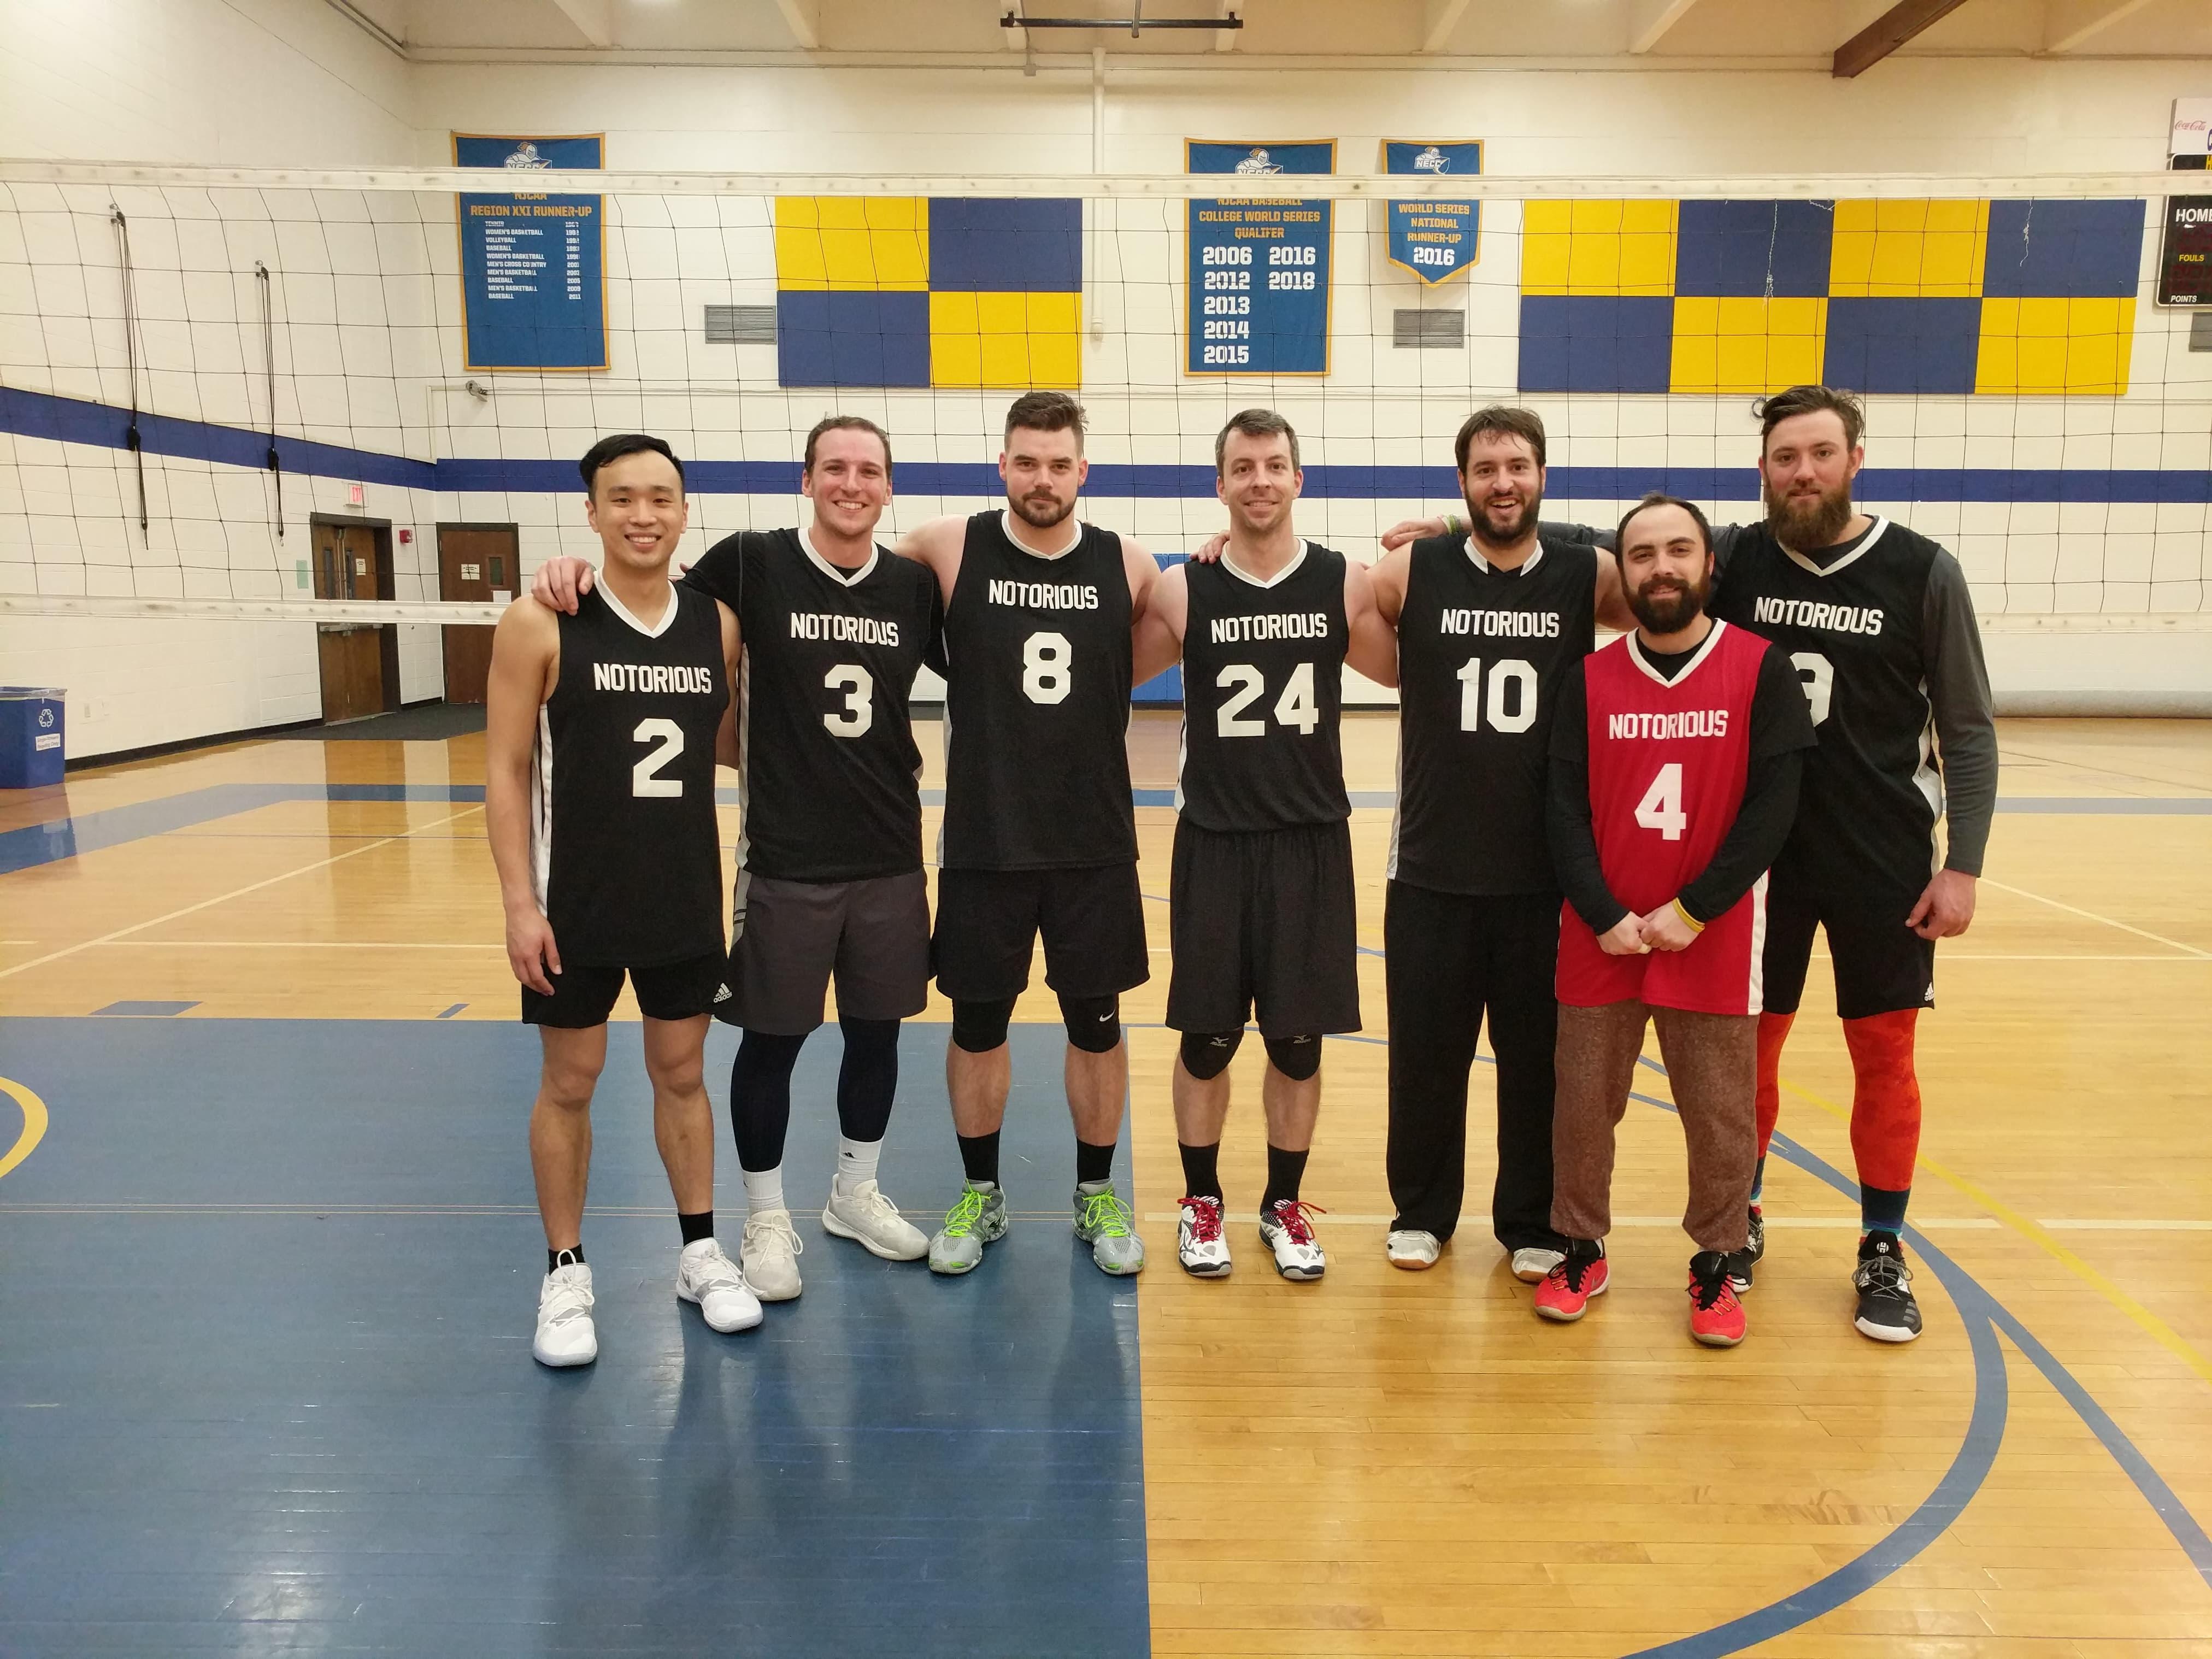 4/7/2019 USAV MBB Champions - NOTORIOUS